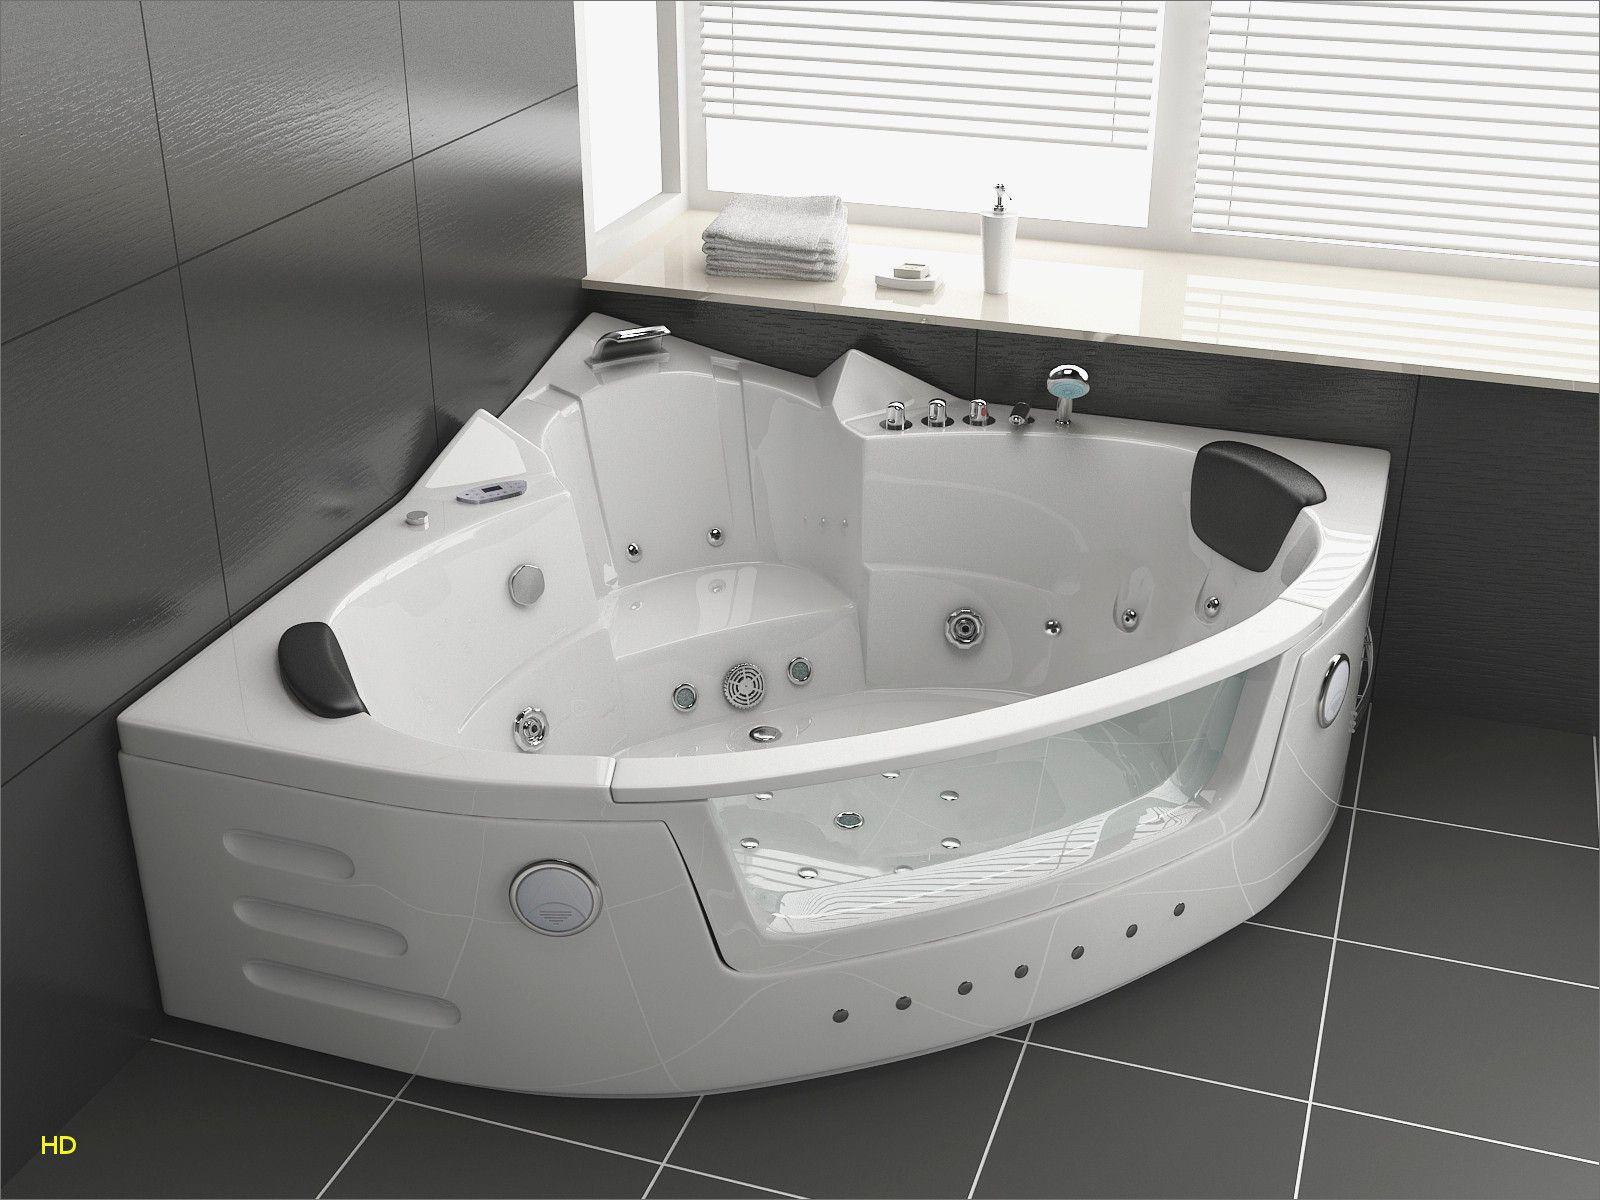 Piece Detachee Baignoire Balneo Nous Aimons Bathtub Design Bathtub Refinish Bathtub